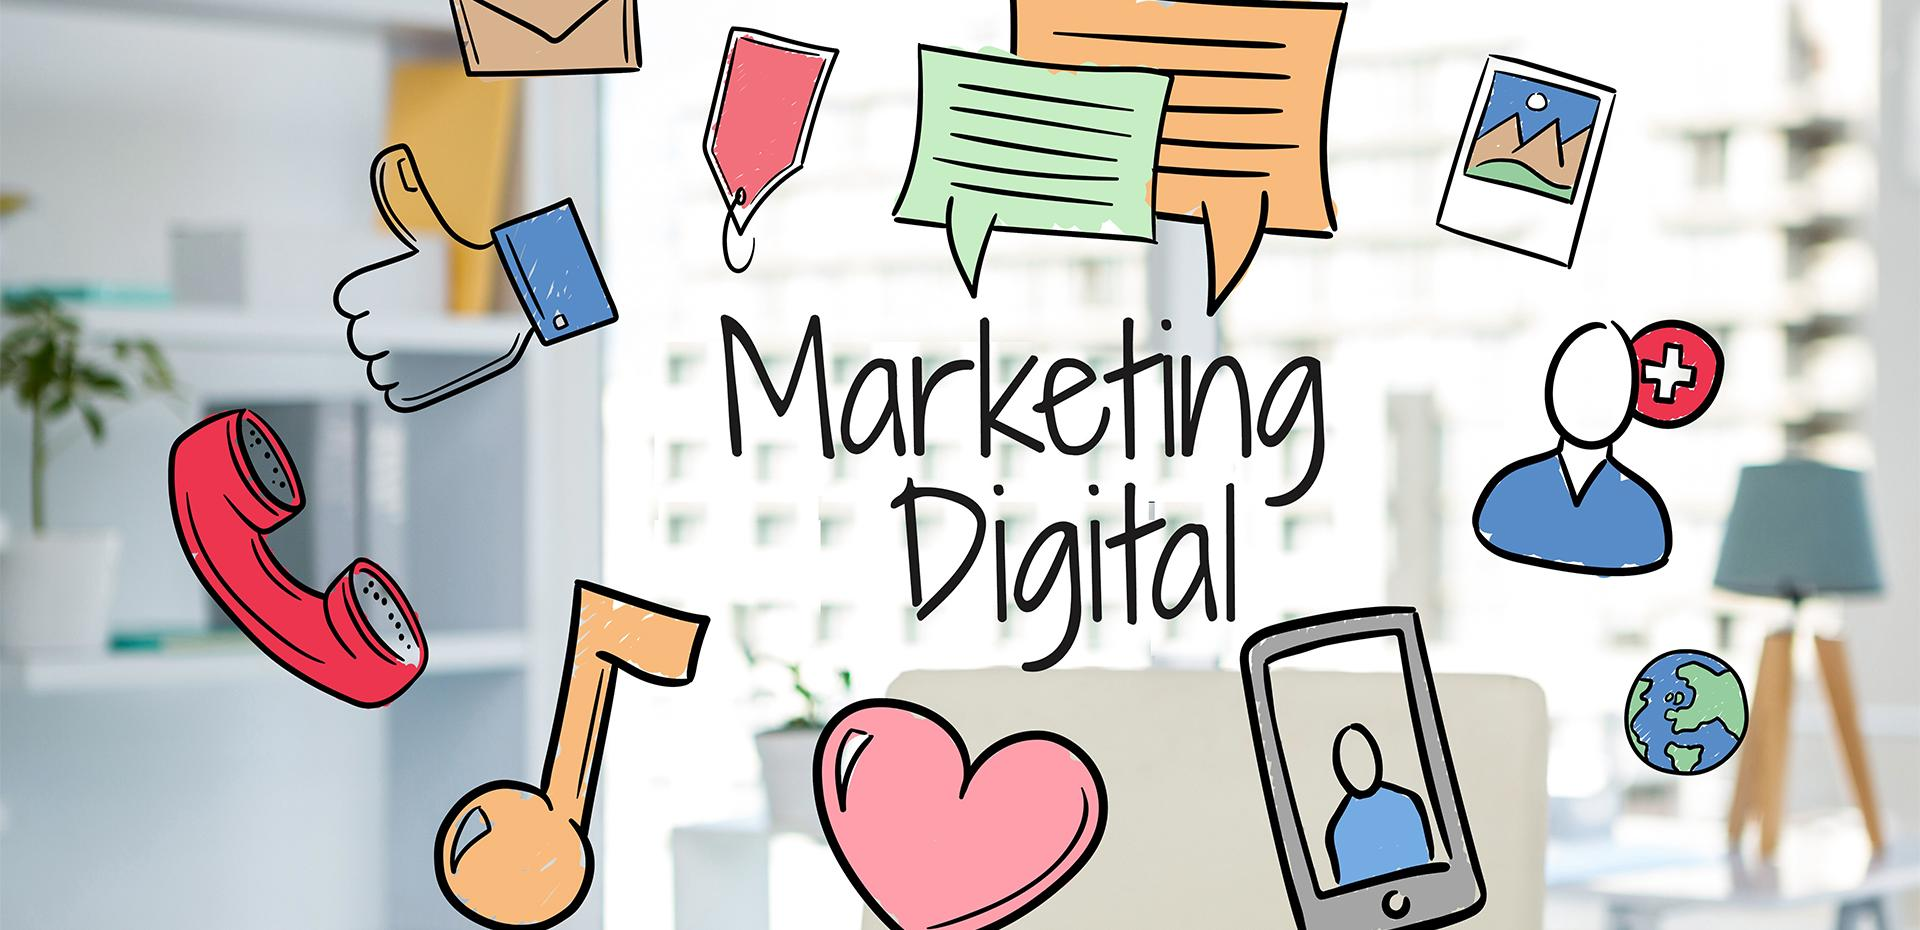 Online Marketing West Caldwell